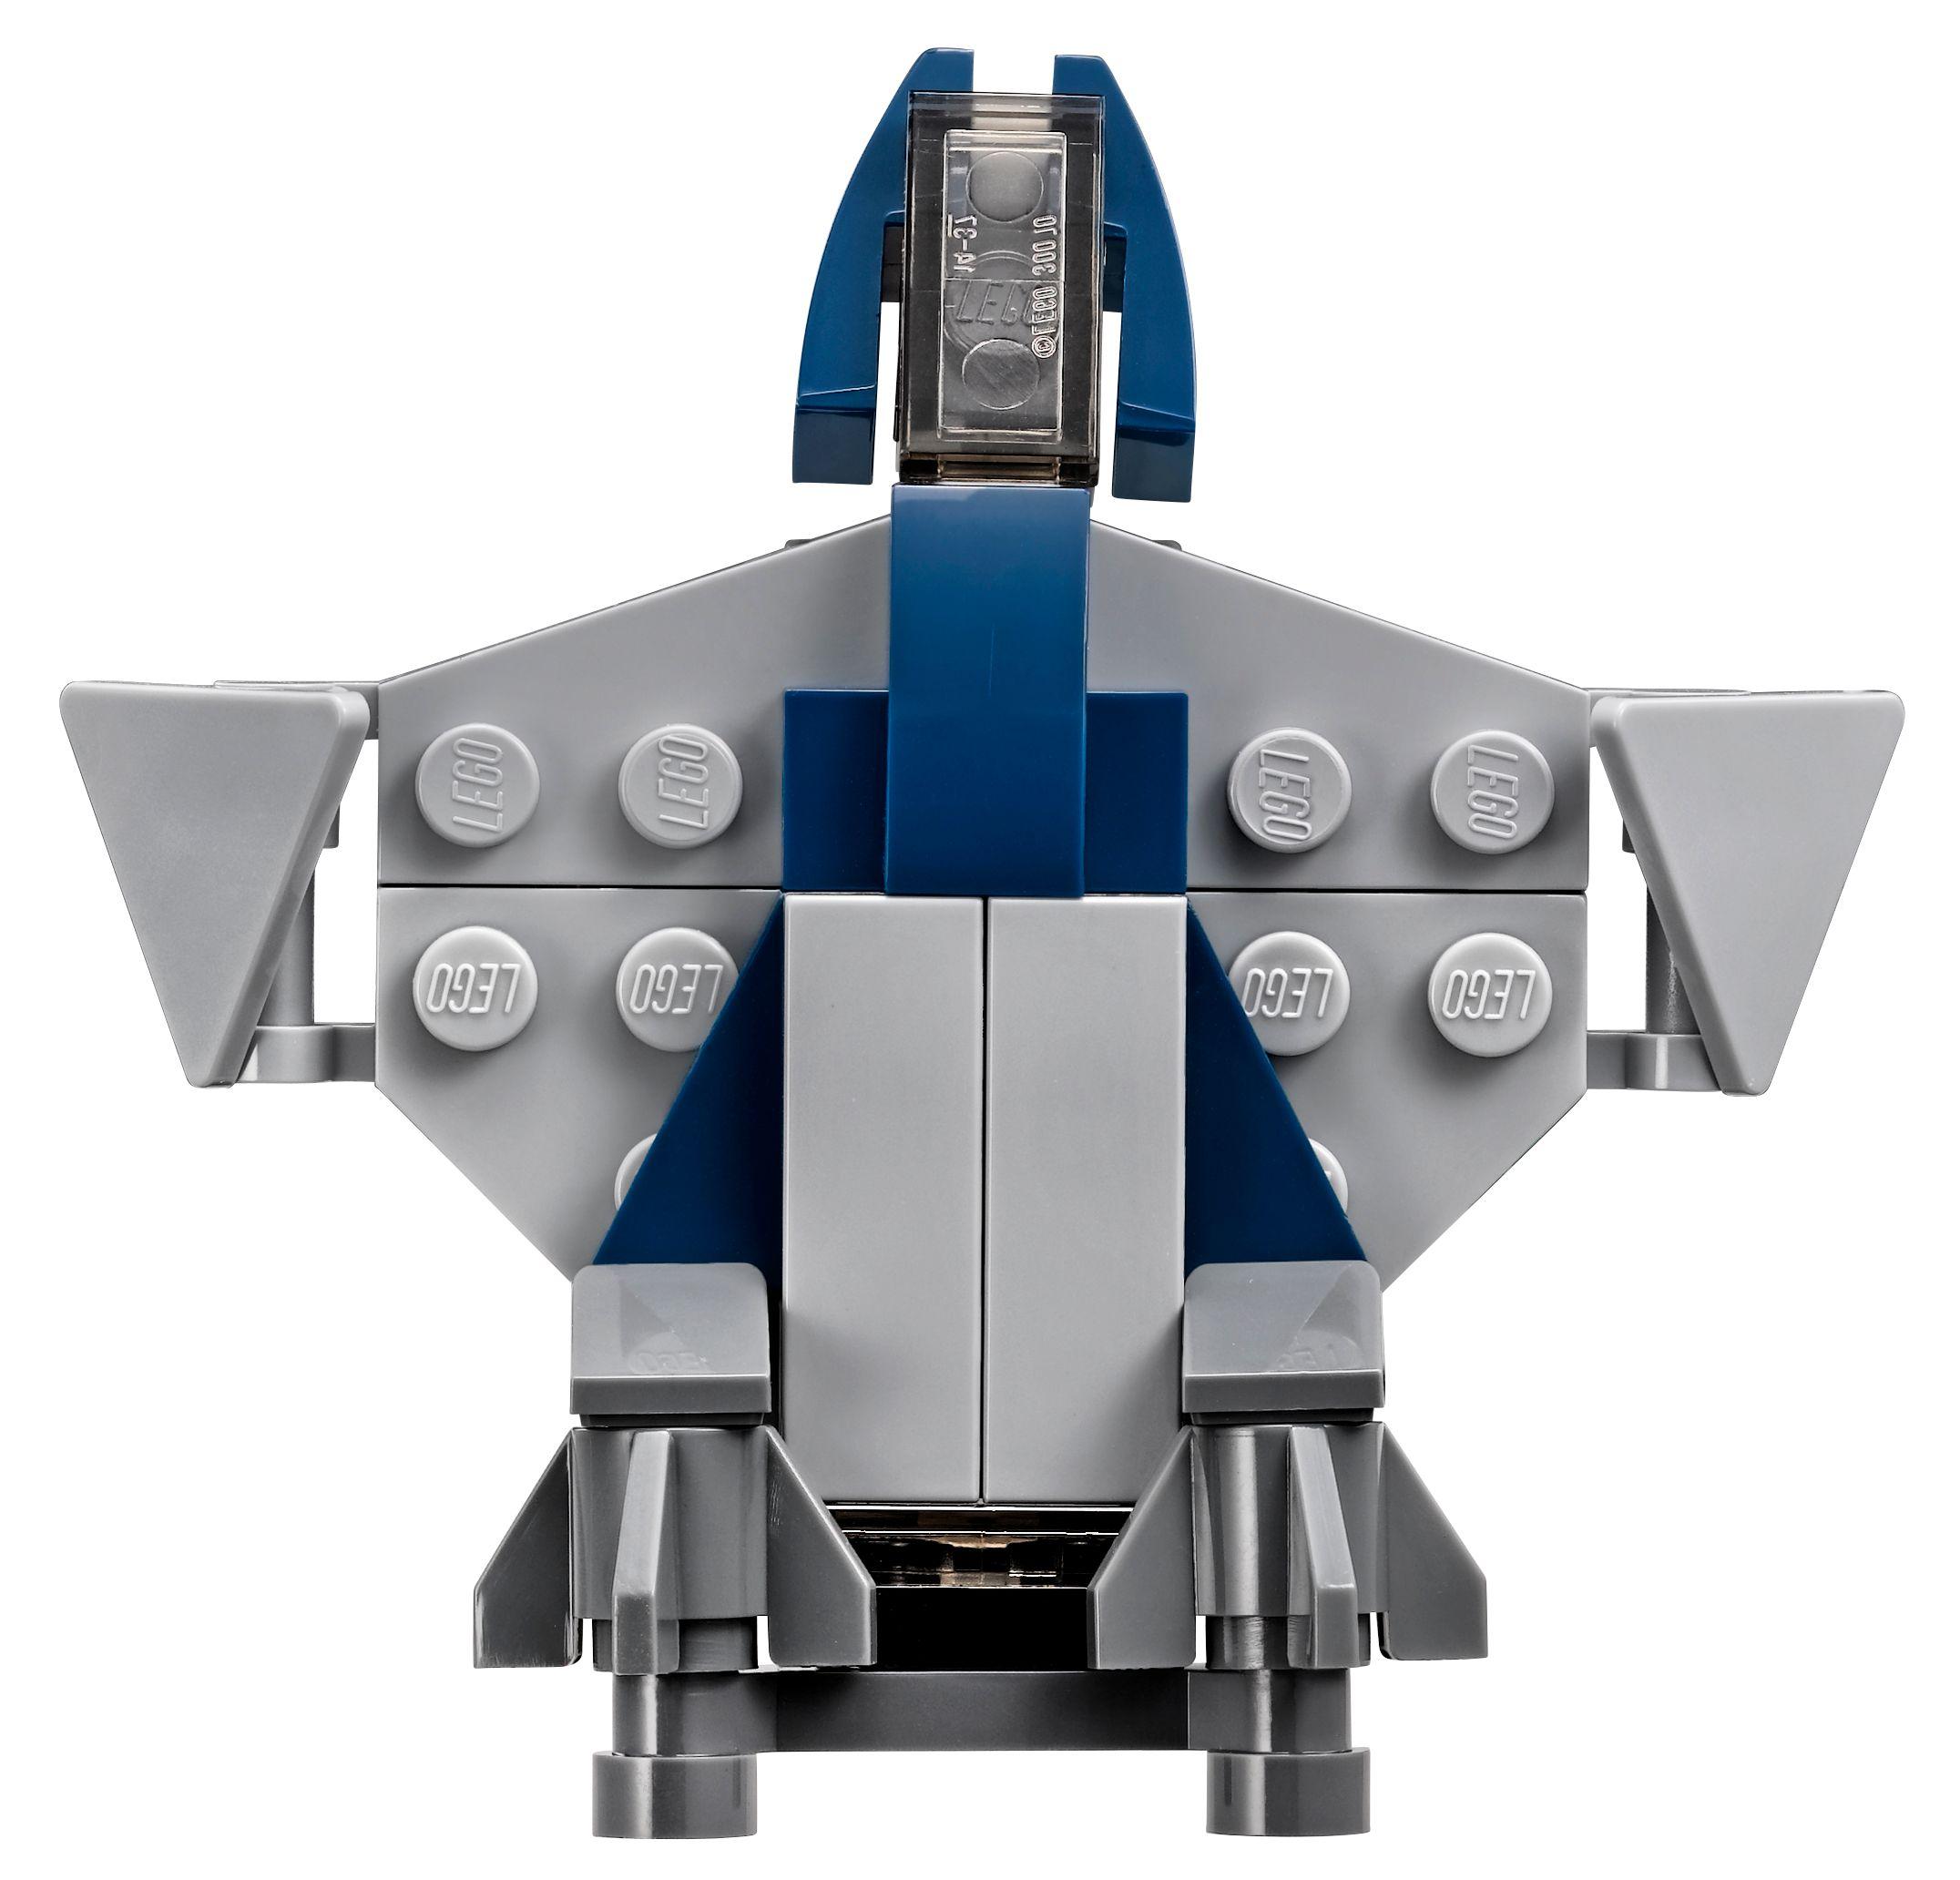 Lego Helicarrier Avengers Image 3